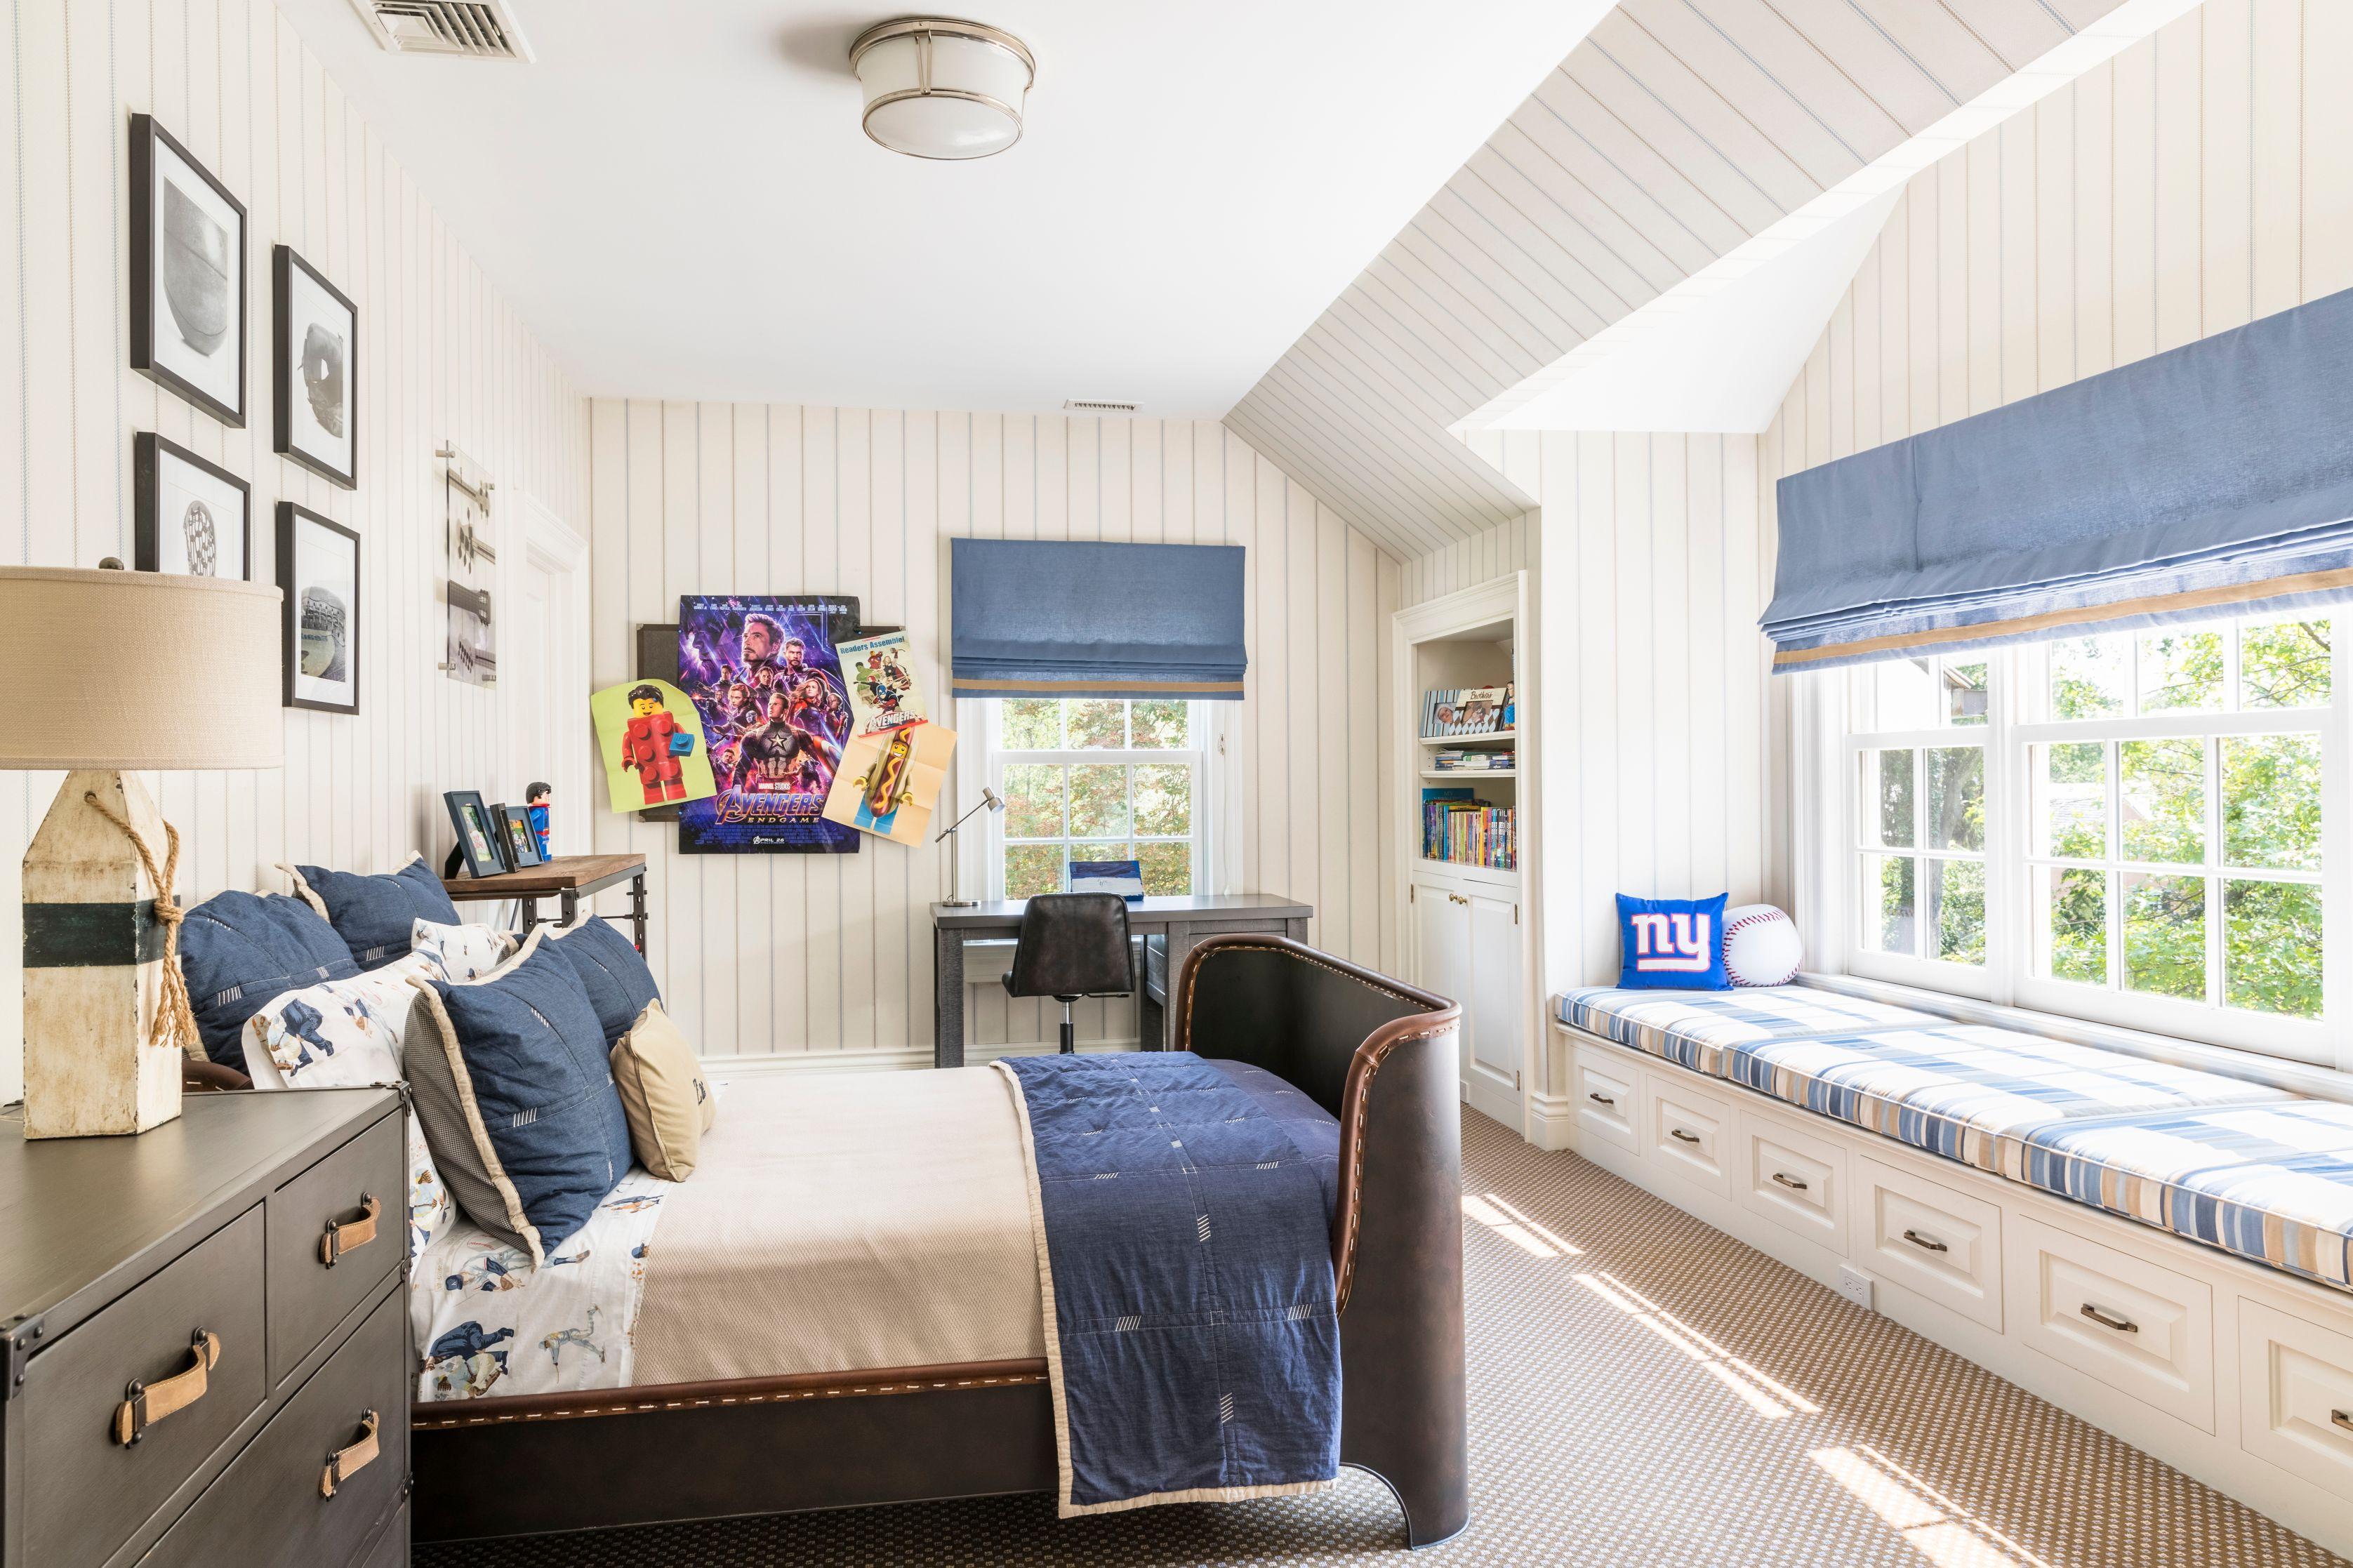 46 Farley Road Bedroom